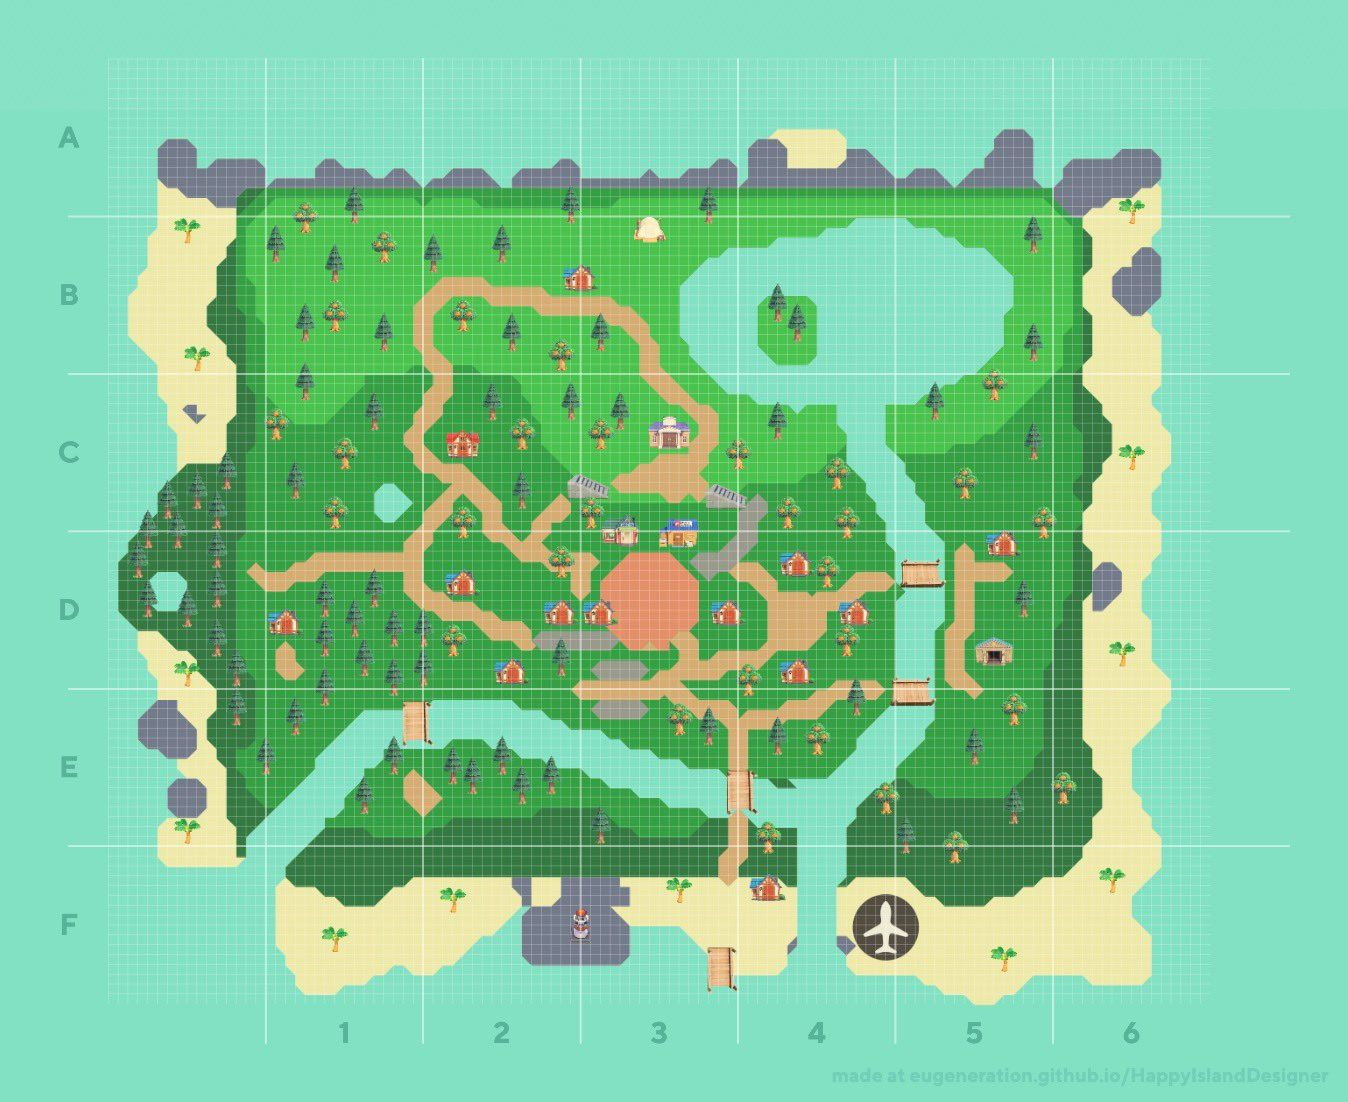 Designer happy island